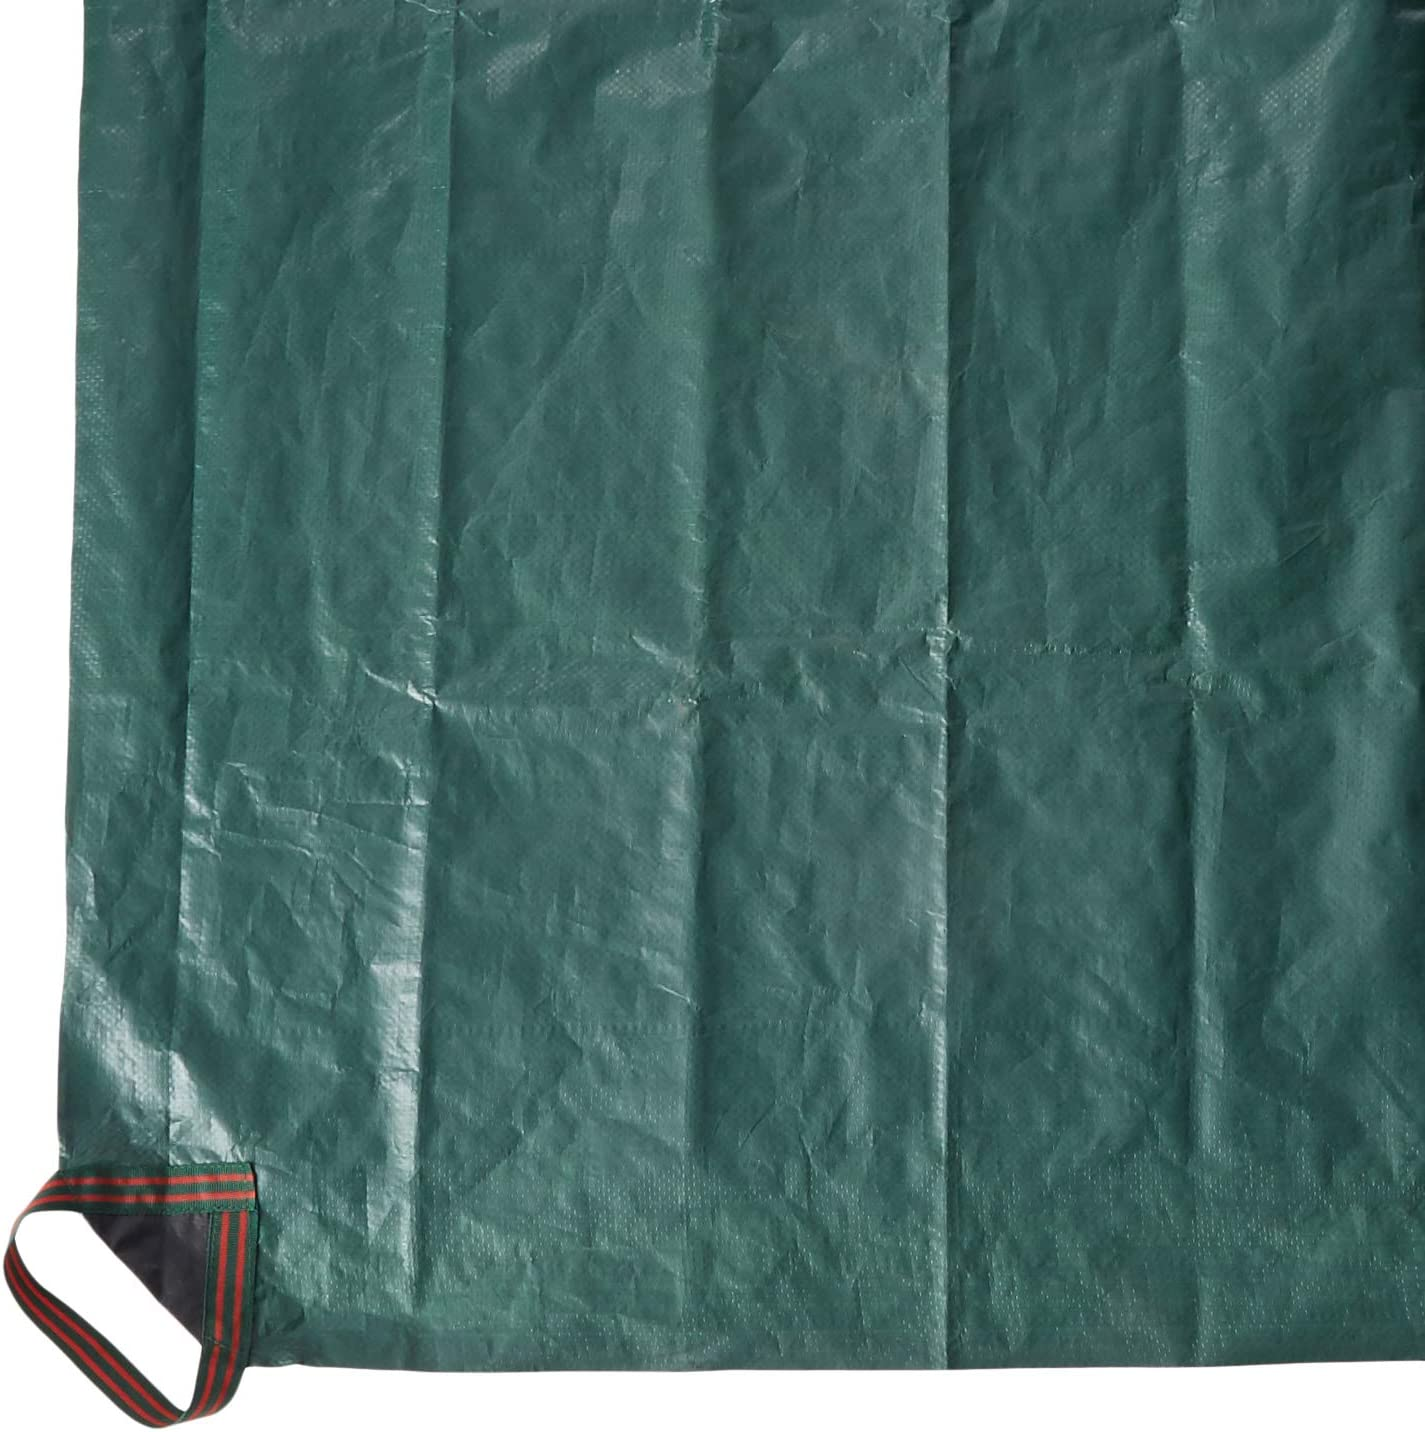 Bosmere Yard Waste Tarp With Corner Handles Green 84 x 84